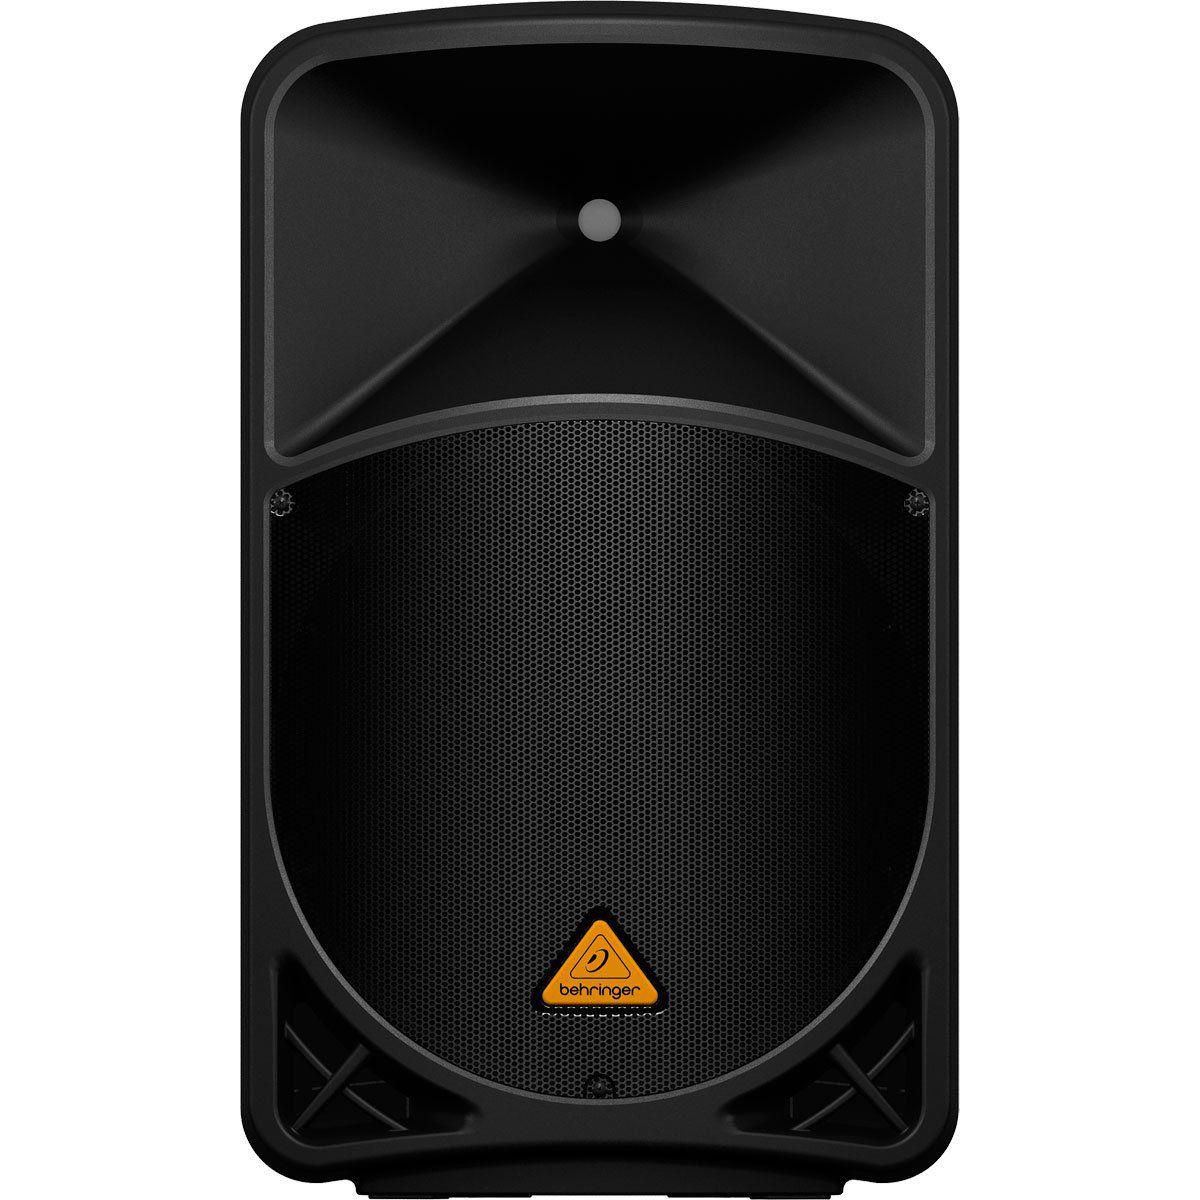 "Caixa amplificada Behringer 12"" pol 1000W B112MP3"